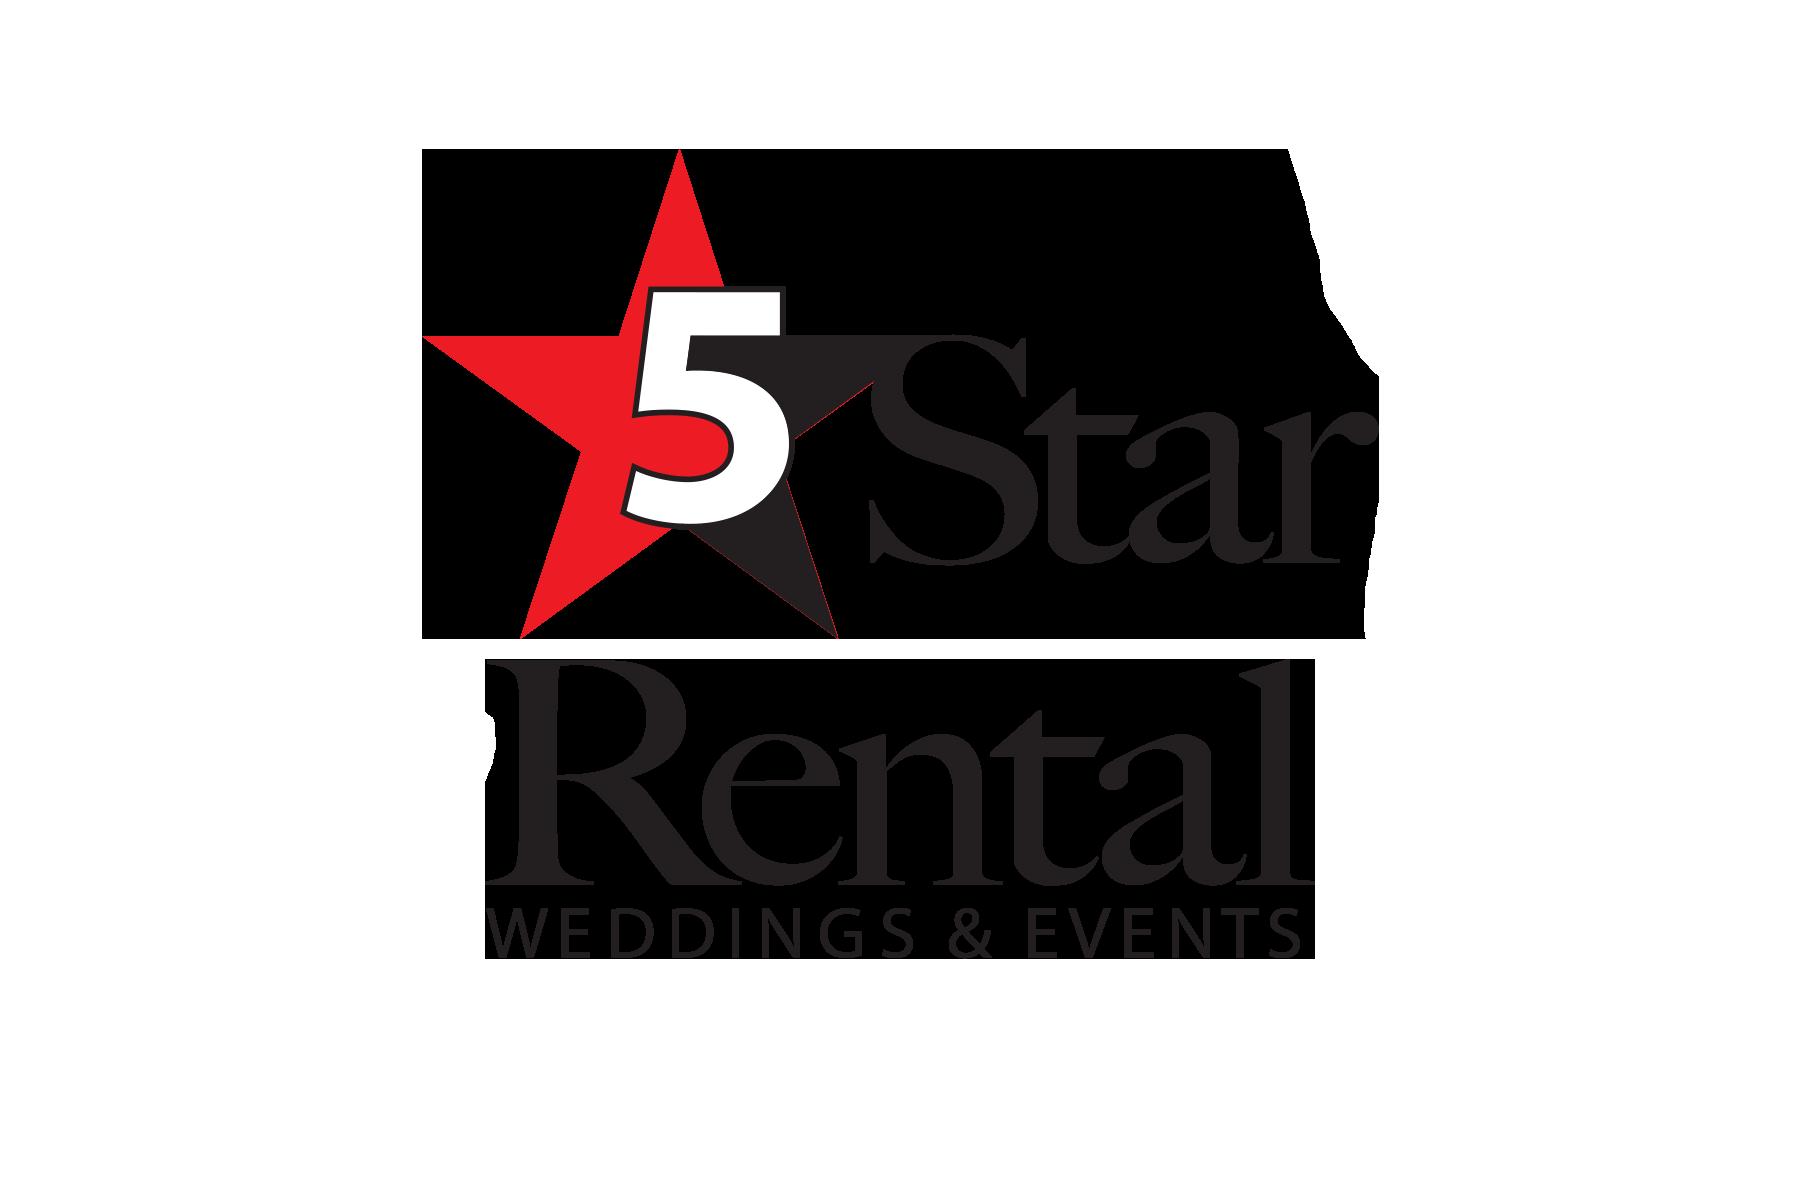 5 Star Rental - 5 Star Rental